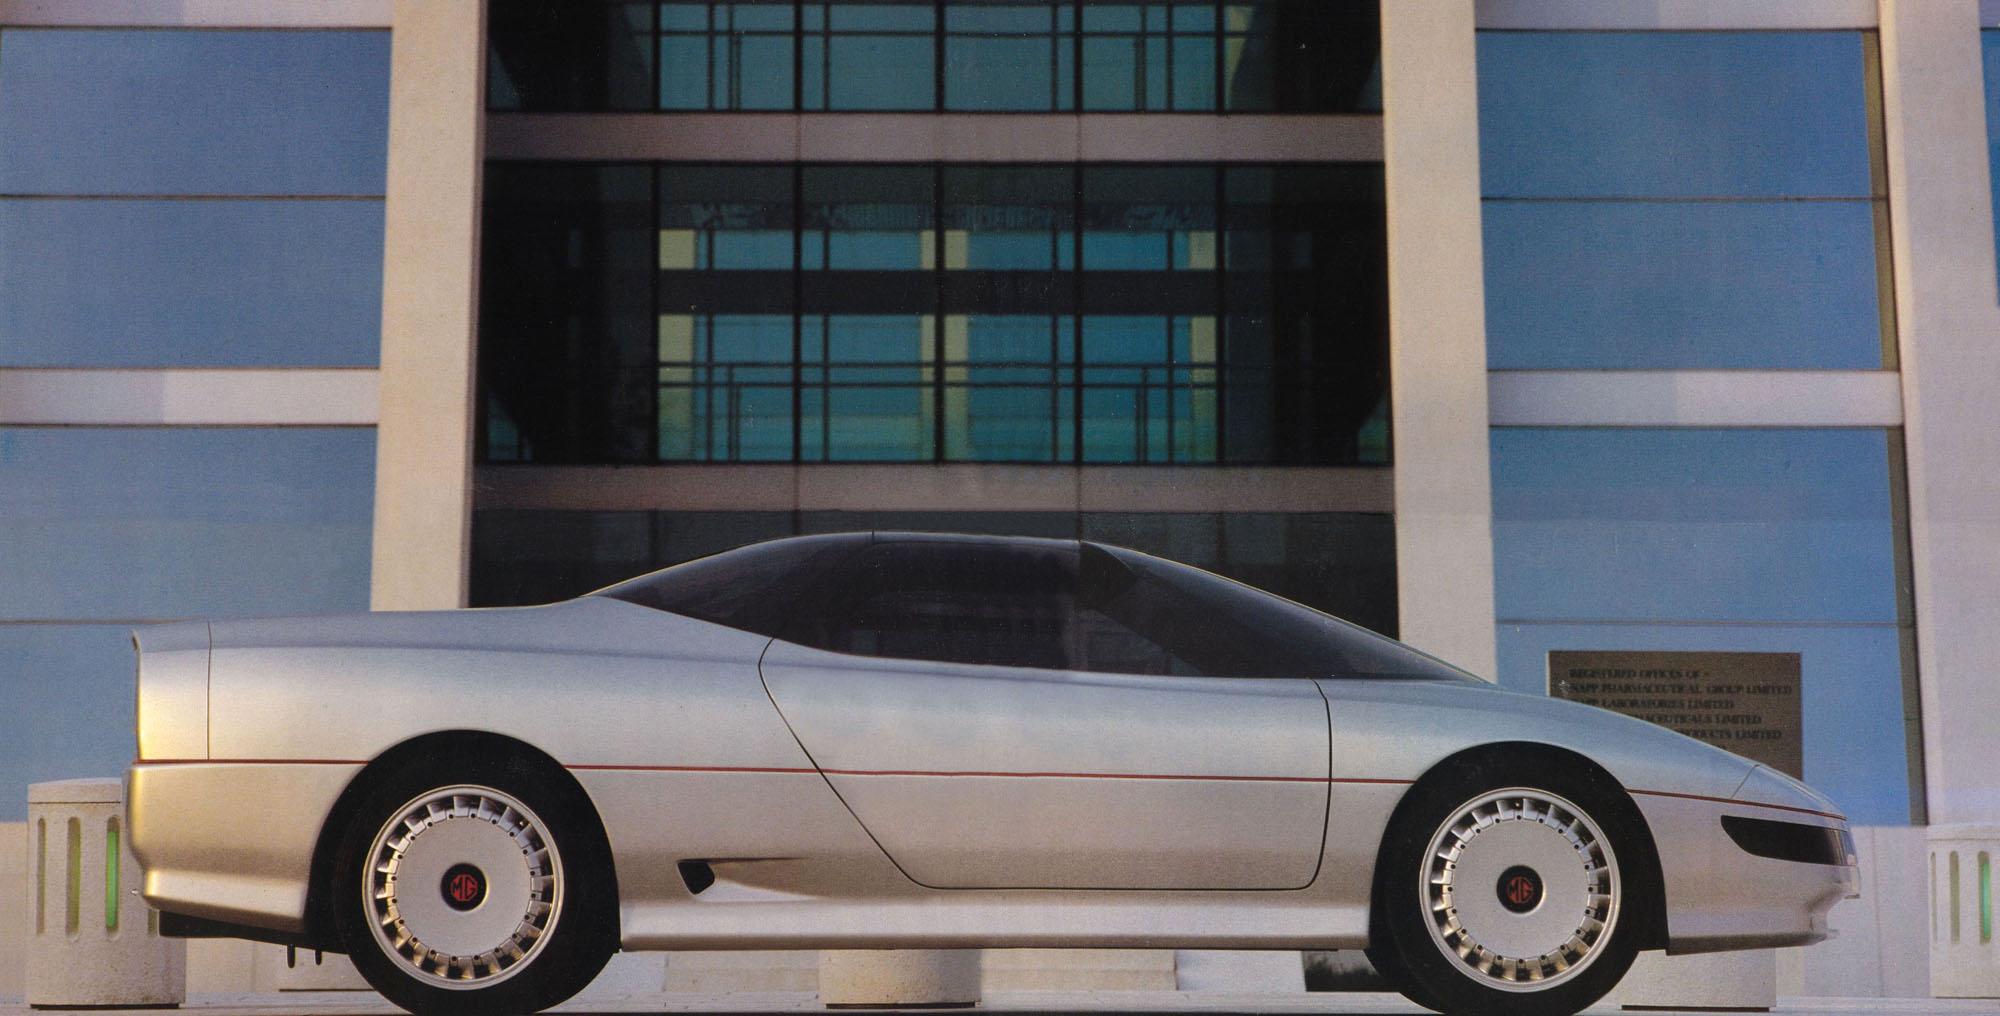 1980s Supercars MG EX E Concept Car